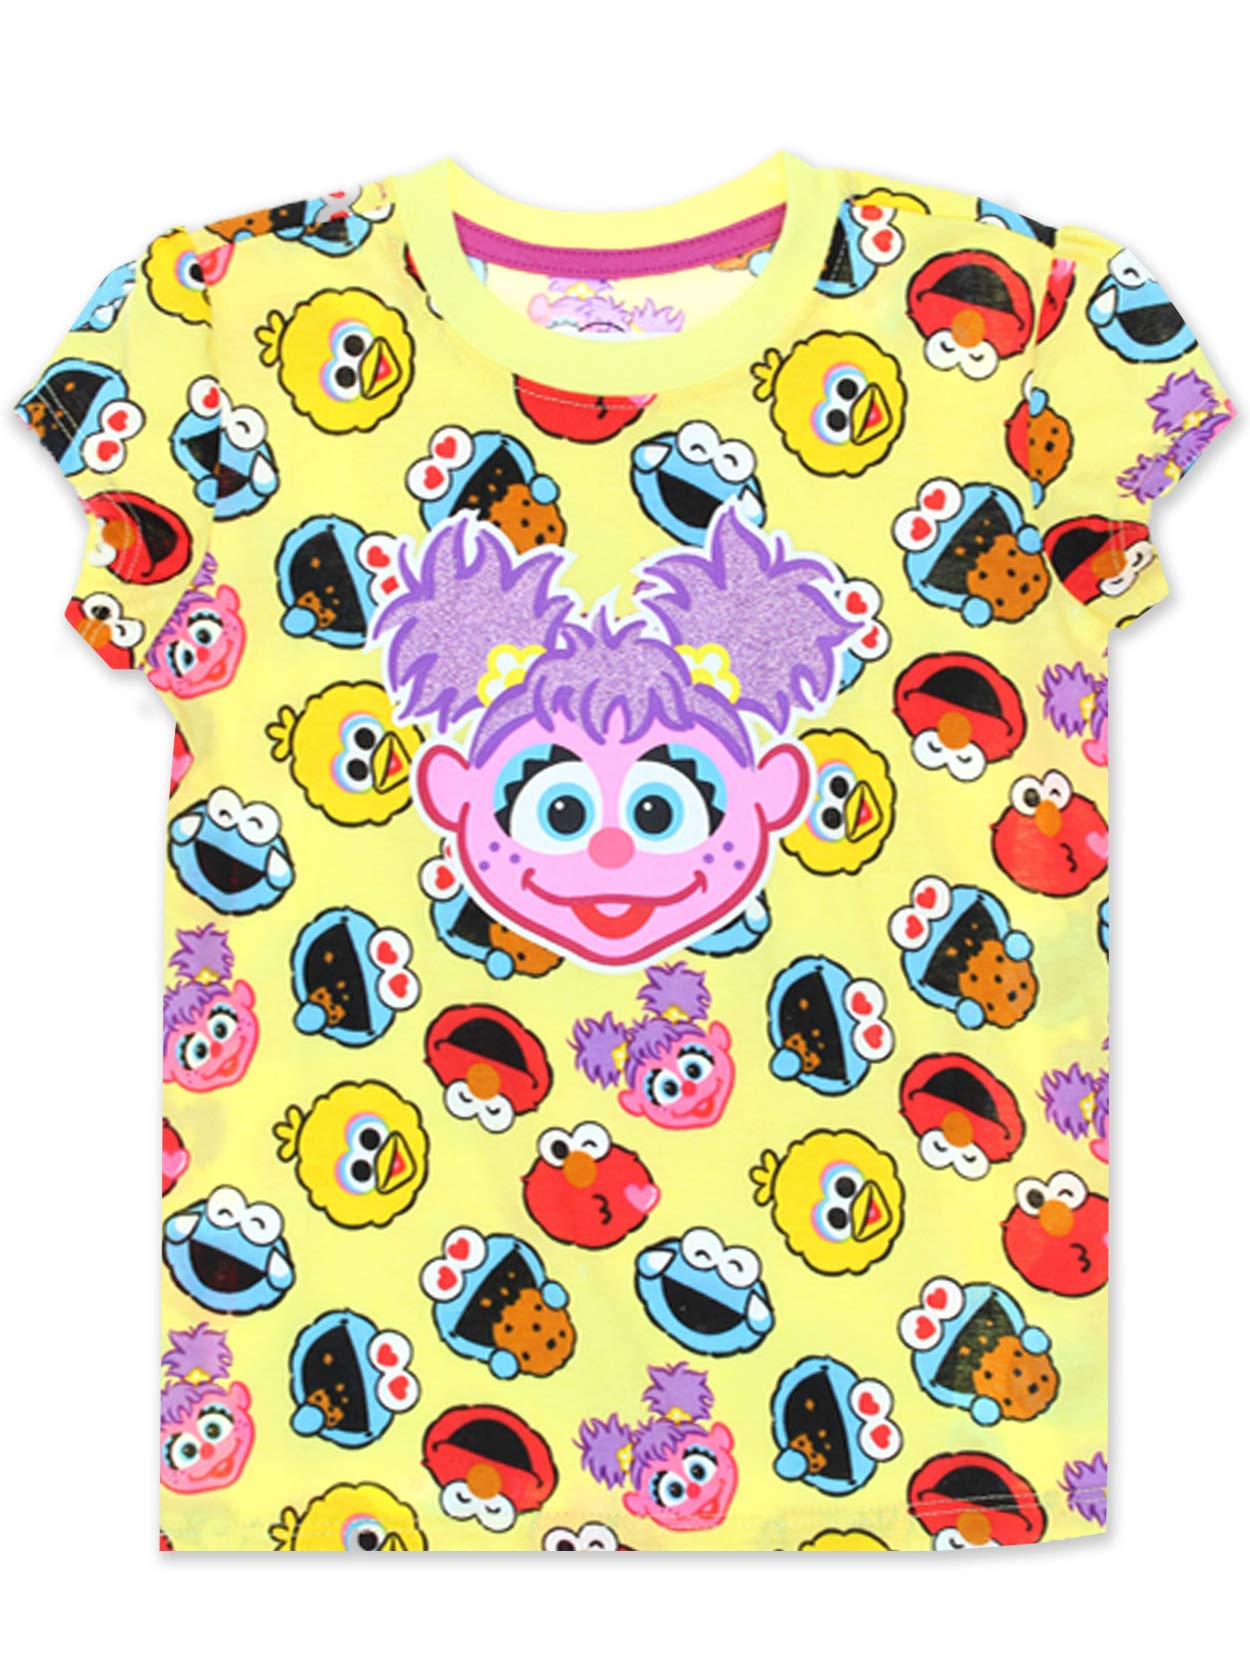 Sesame Street Abby Cadabby Toddler Baby Girls Short Sleeve Tee (3T, Yellow/Multi) by Sesame Street